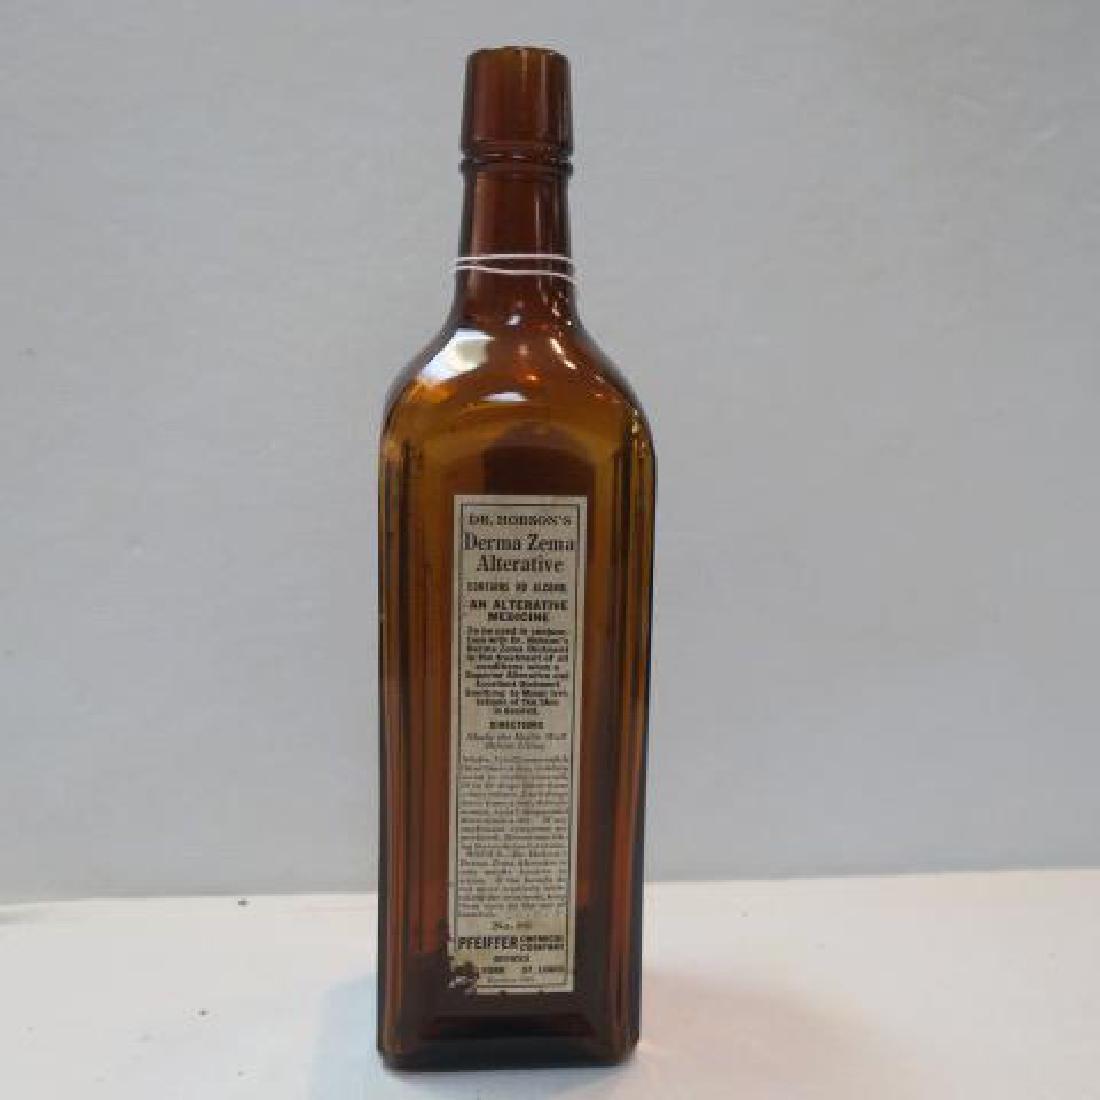 DR HOBSON'S DERMA ZEMA ALTERNATIVE Amber Glass Bottle: